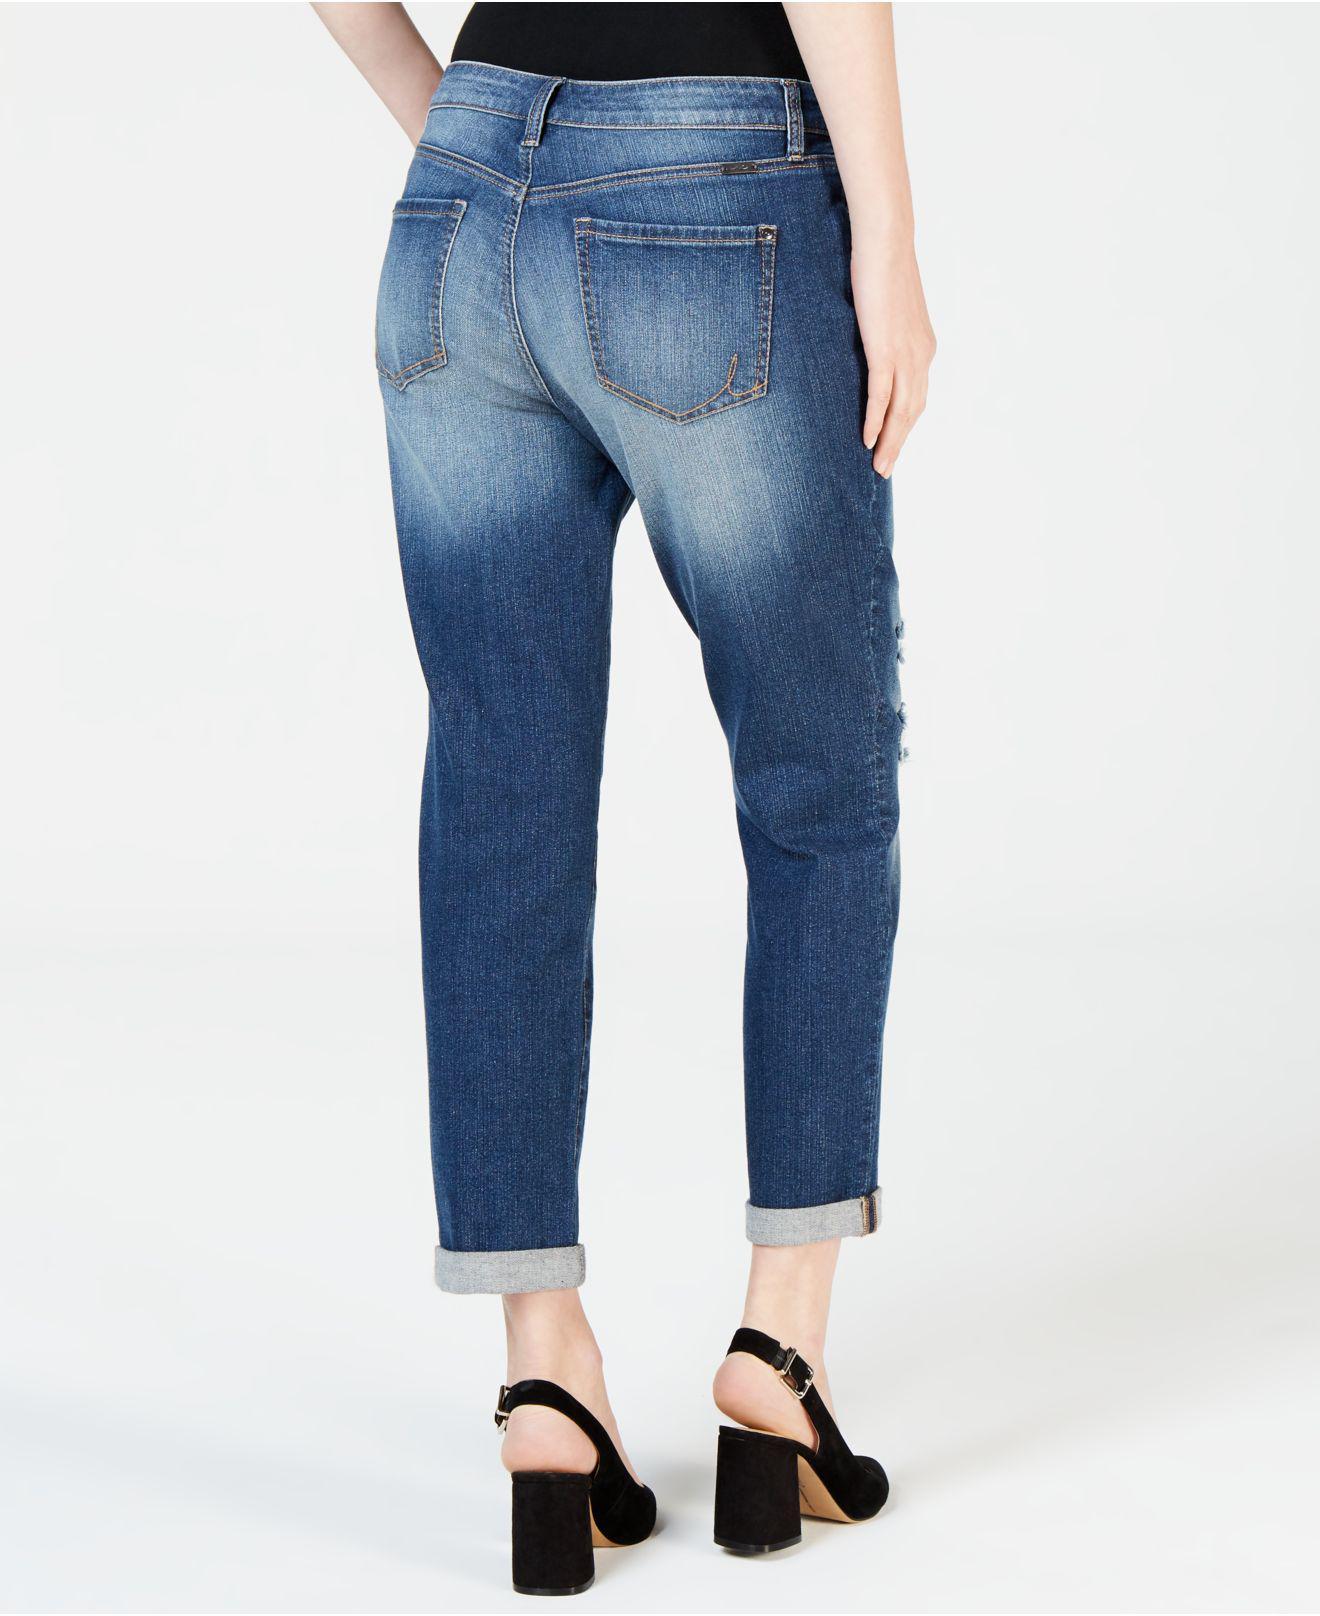 a3de01214fa Lyst - INC International Concepts I.n.c. Ripped Curvy-fit Boyfriend Jeans